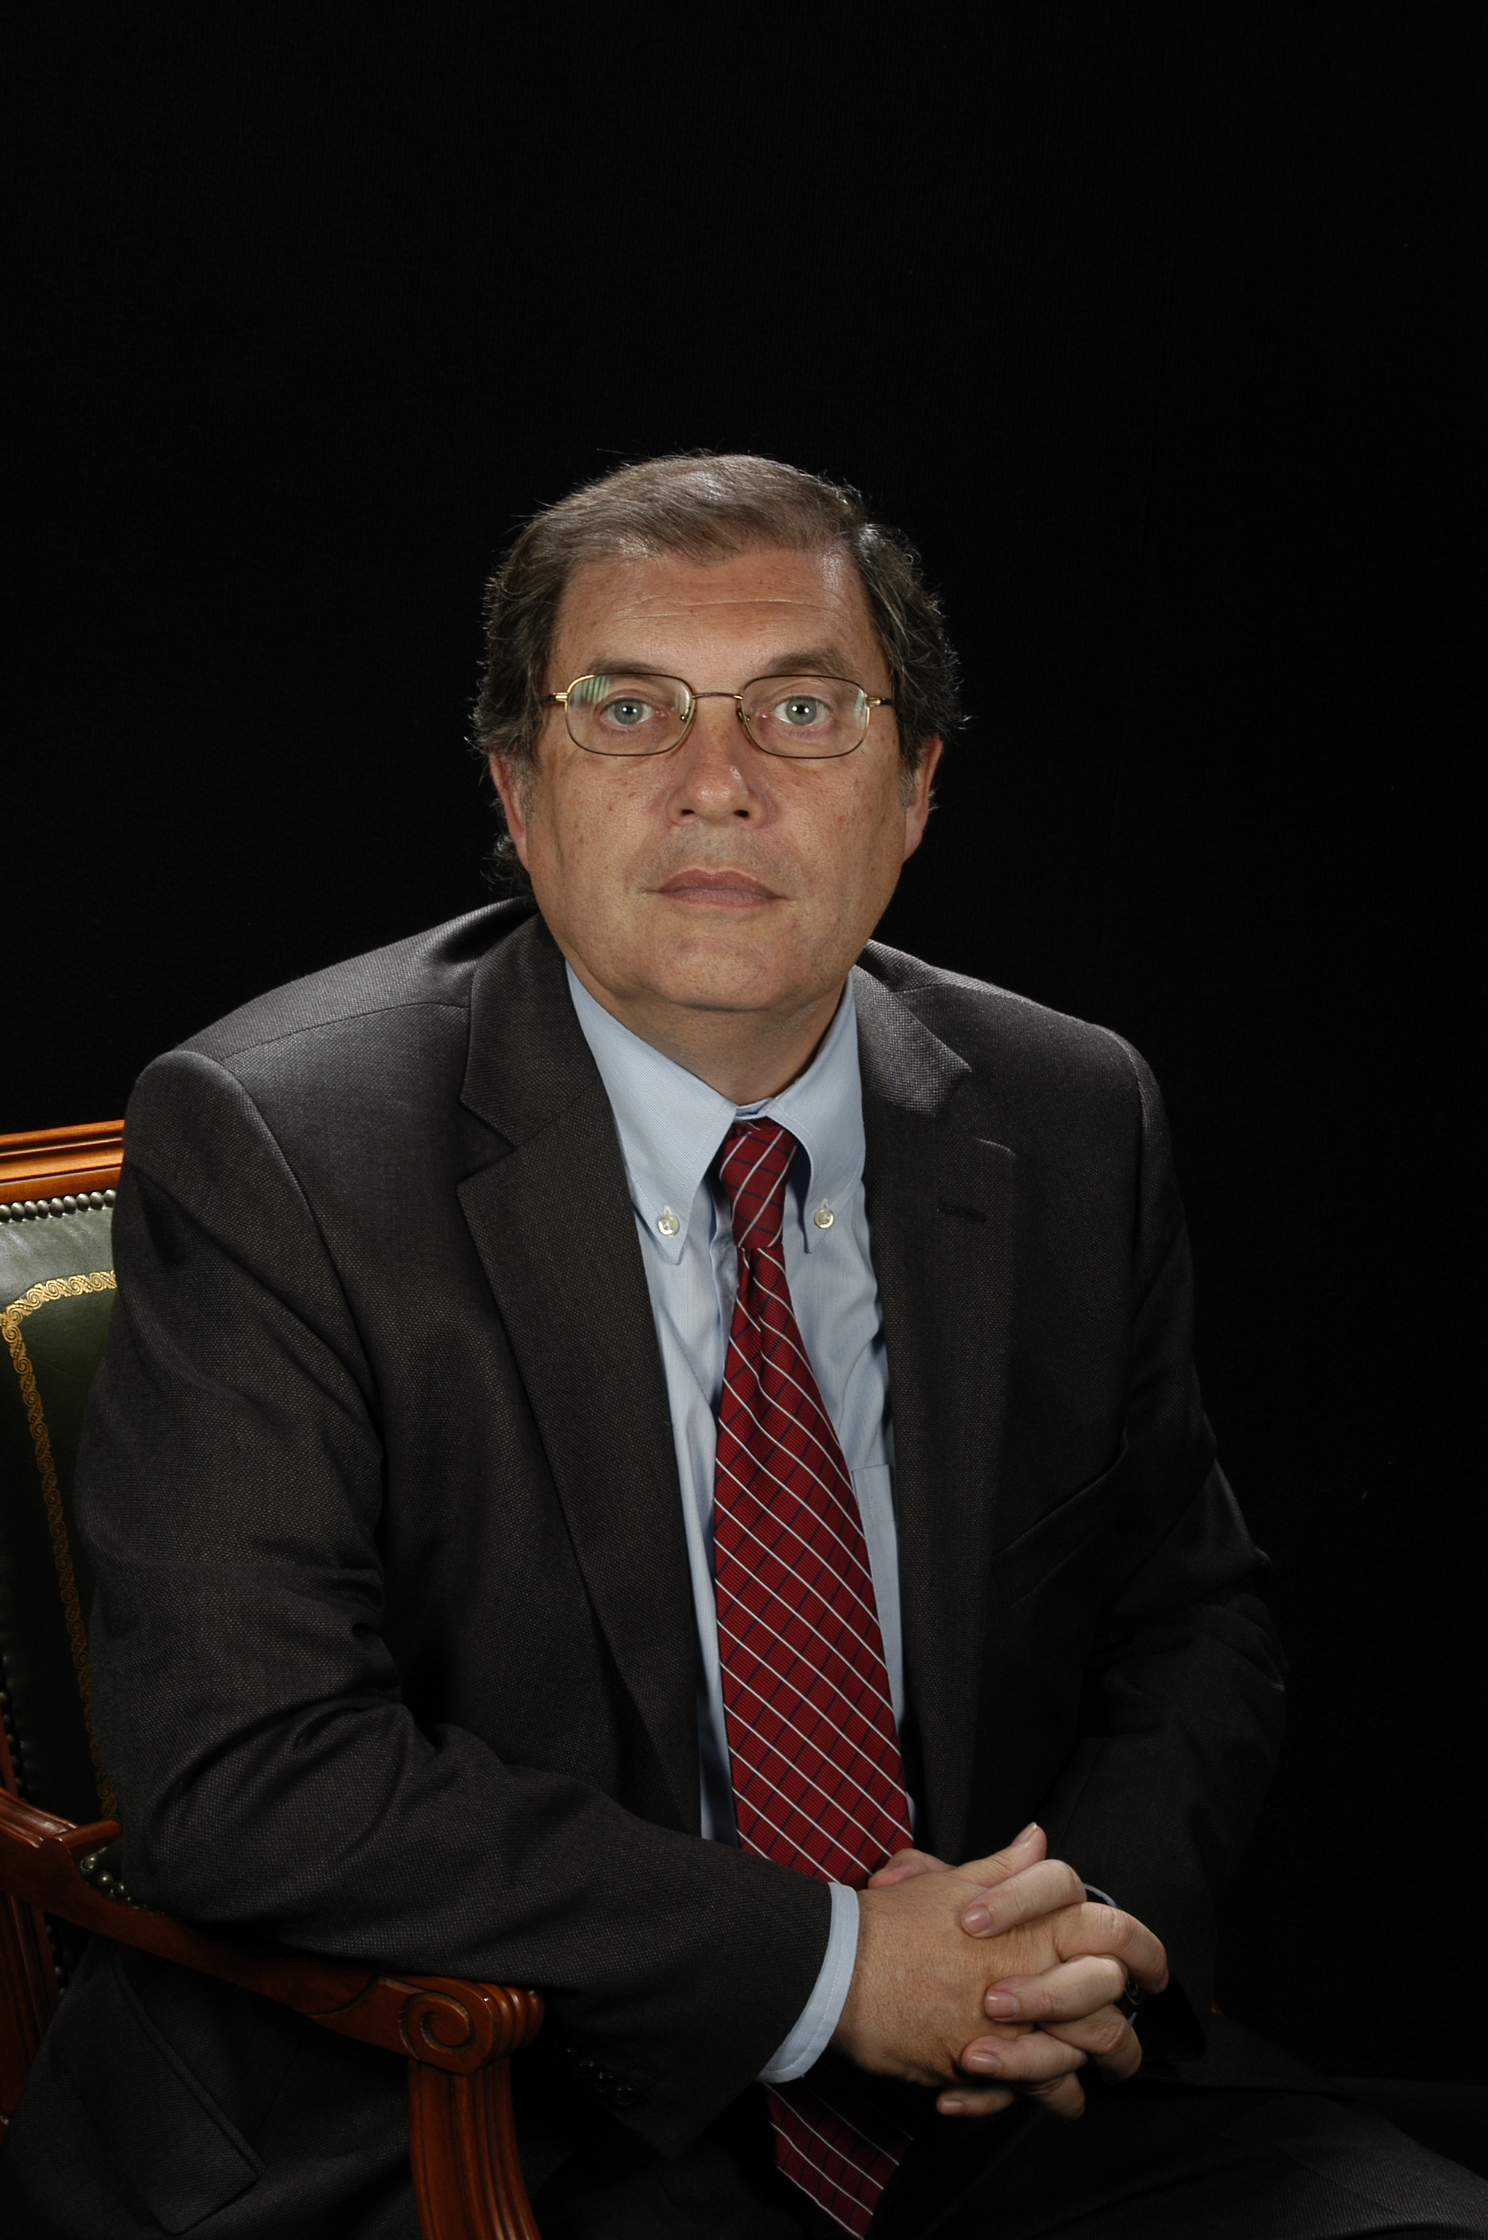 Sr. Manuel Nadal Pellejero